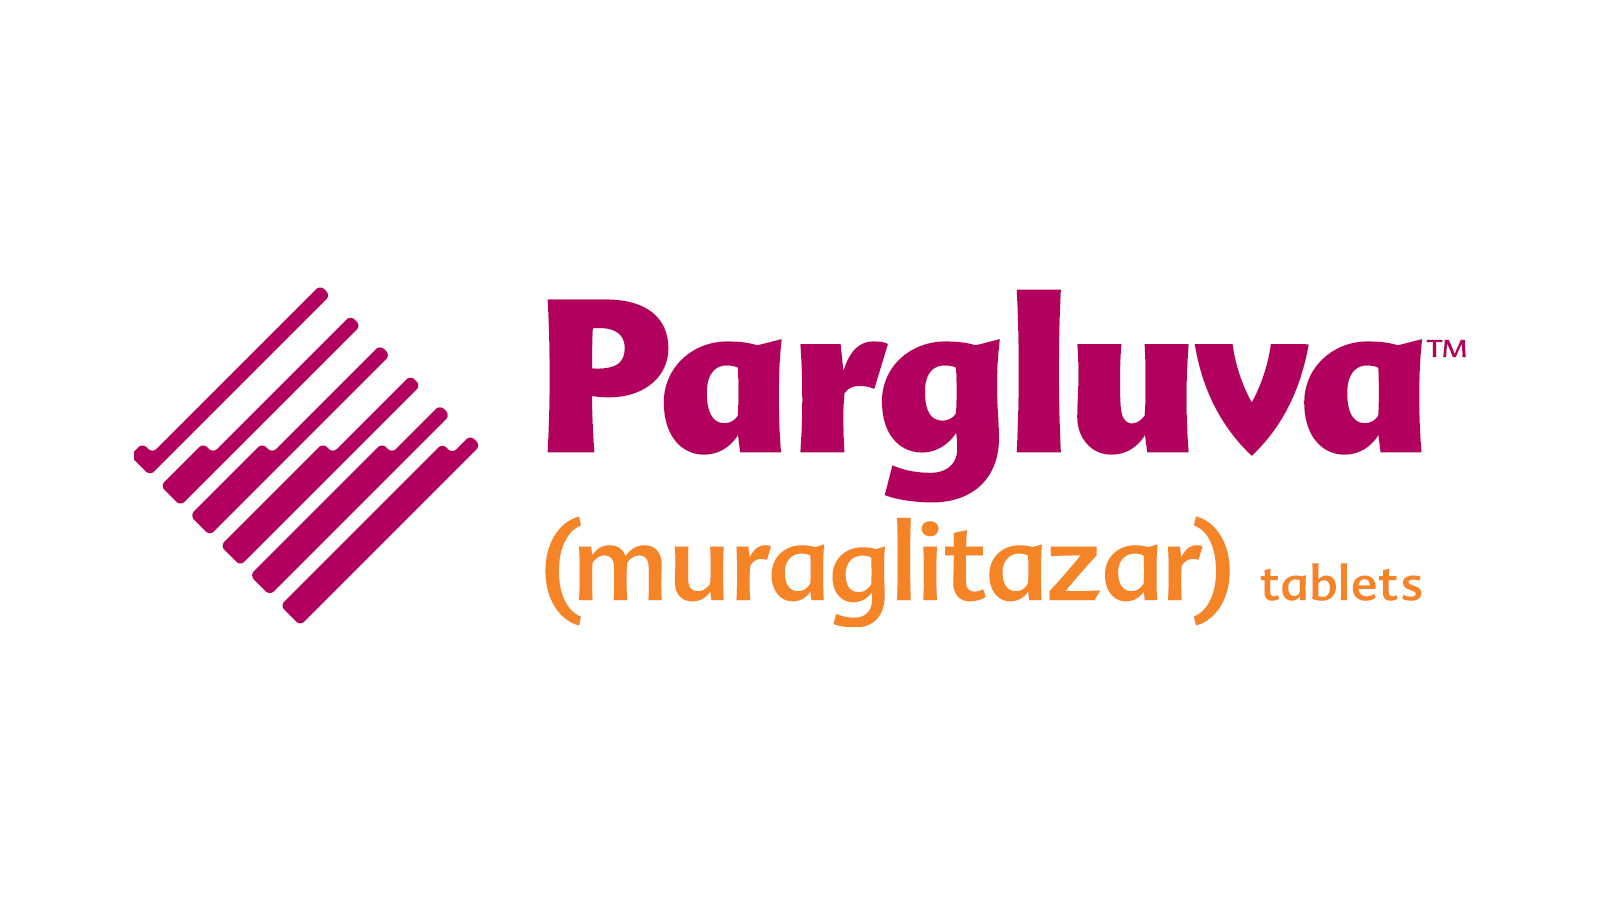 Pargluva Logo Concept